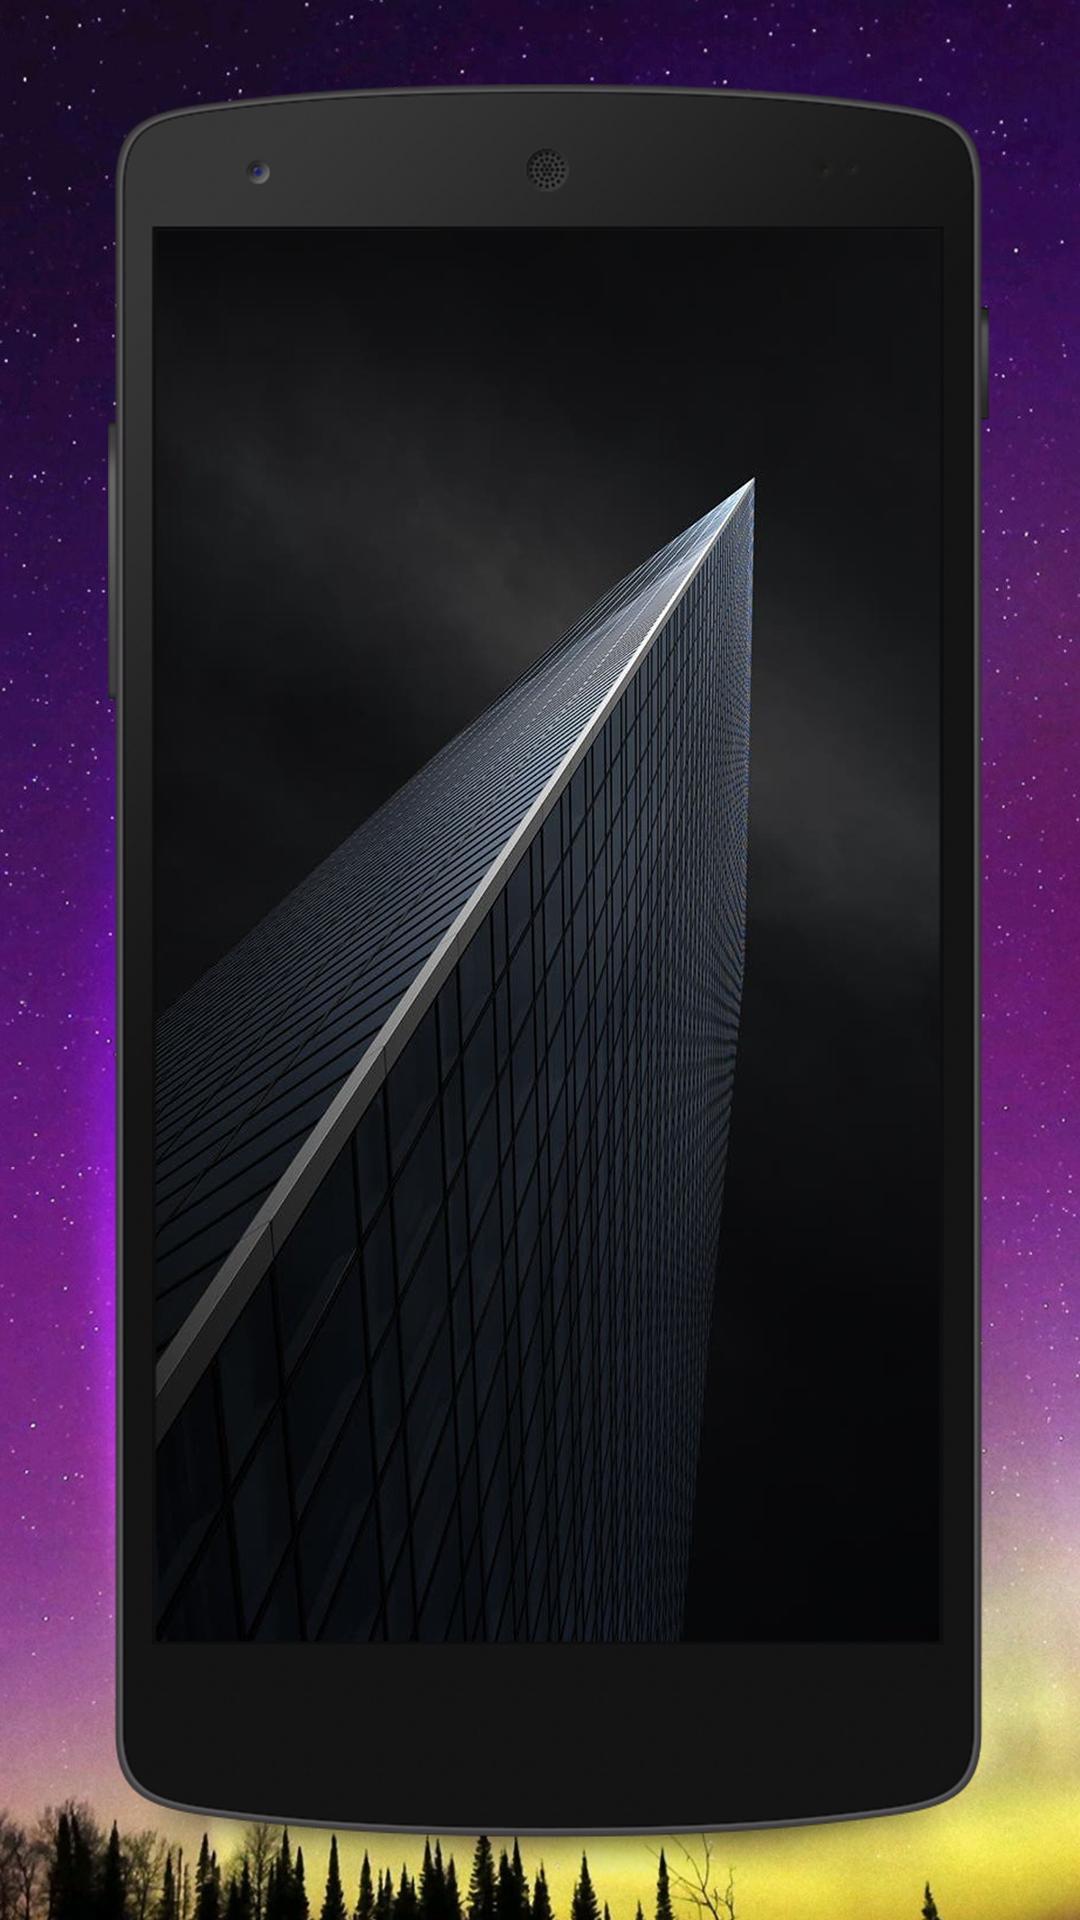 Unduh 7700 Wallpaper Hitam Super Amoled HD Terbaik